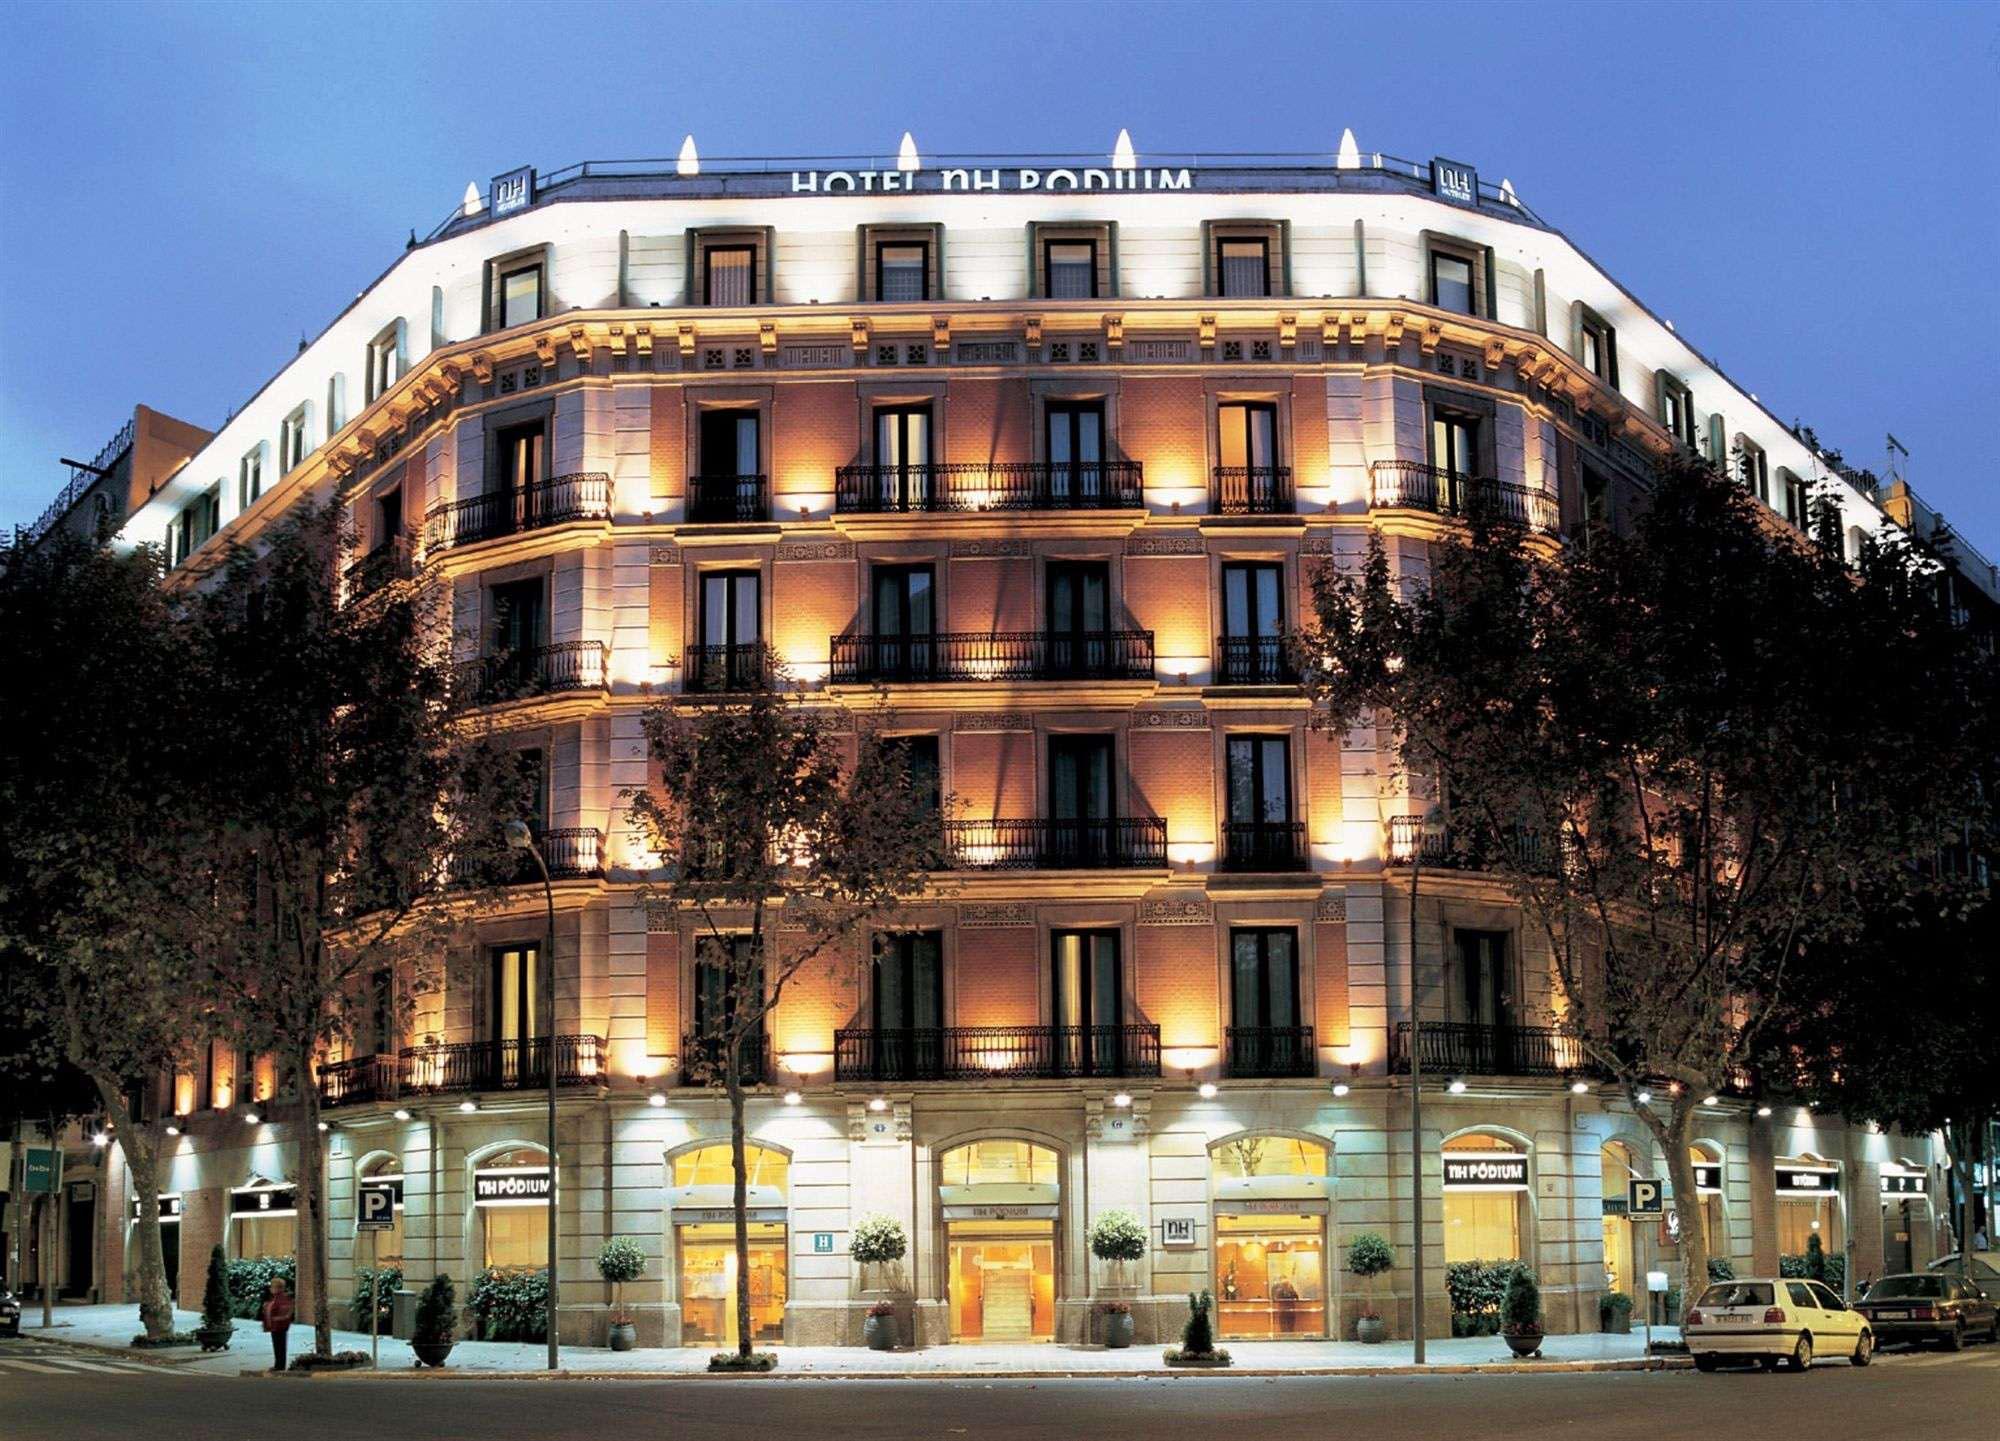 Fachadad Hotel NH Pódium Barcelona